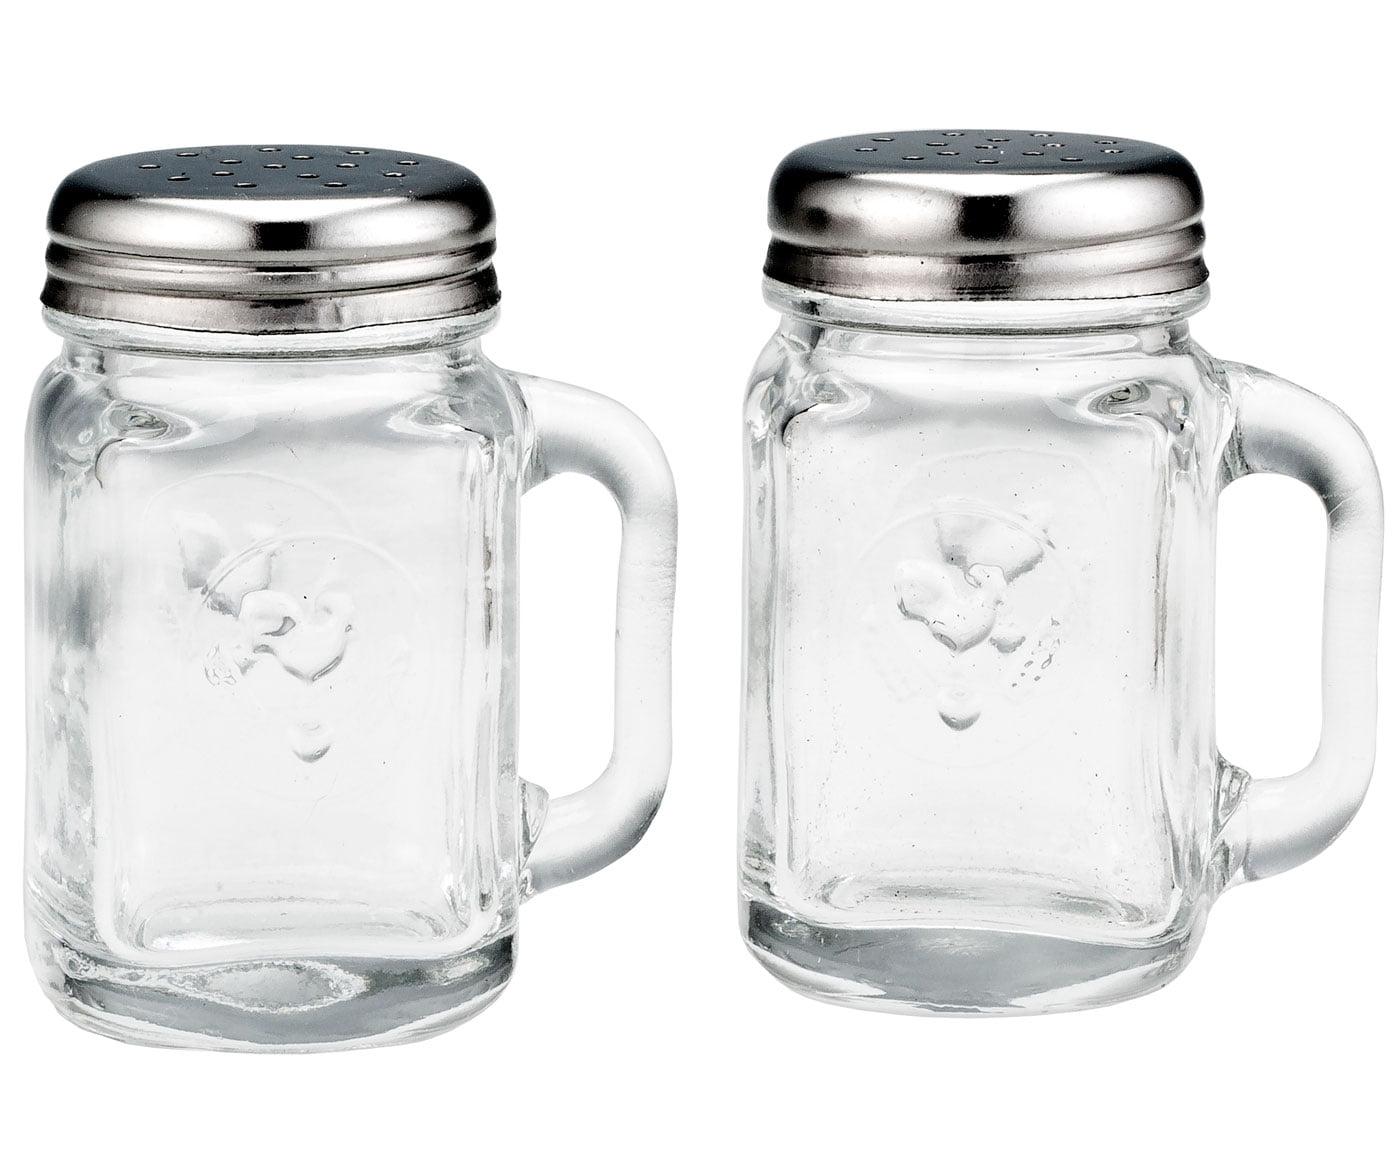 Mason Jar Salt & Pepper Shakers by Walter Drake